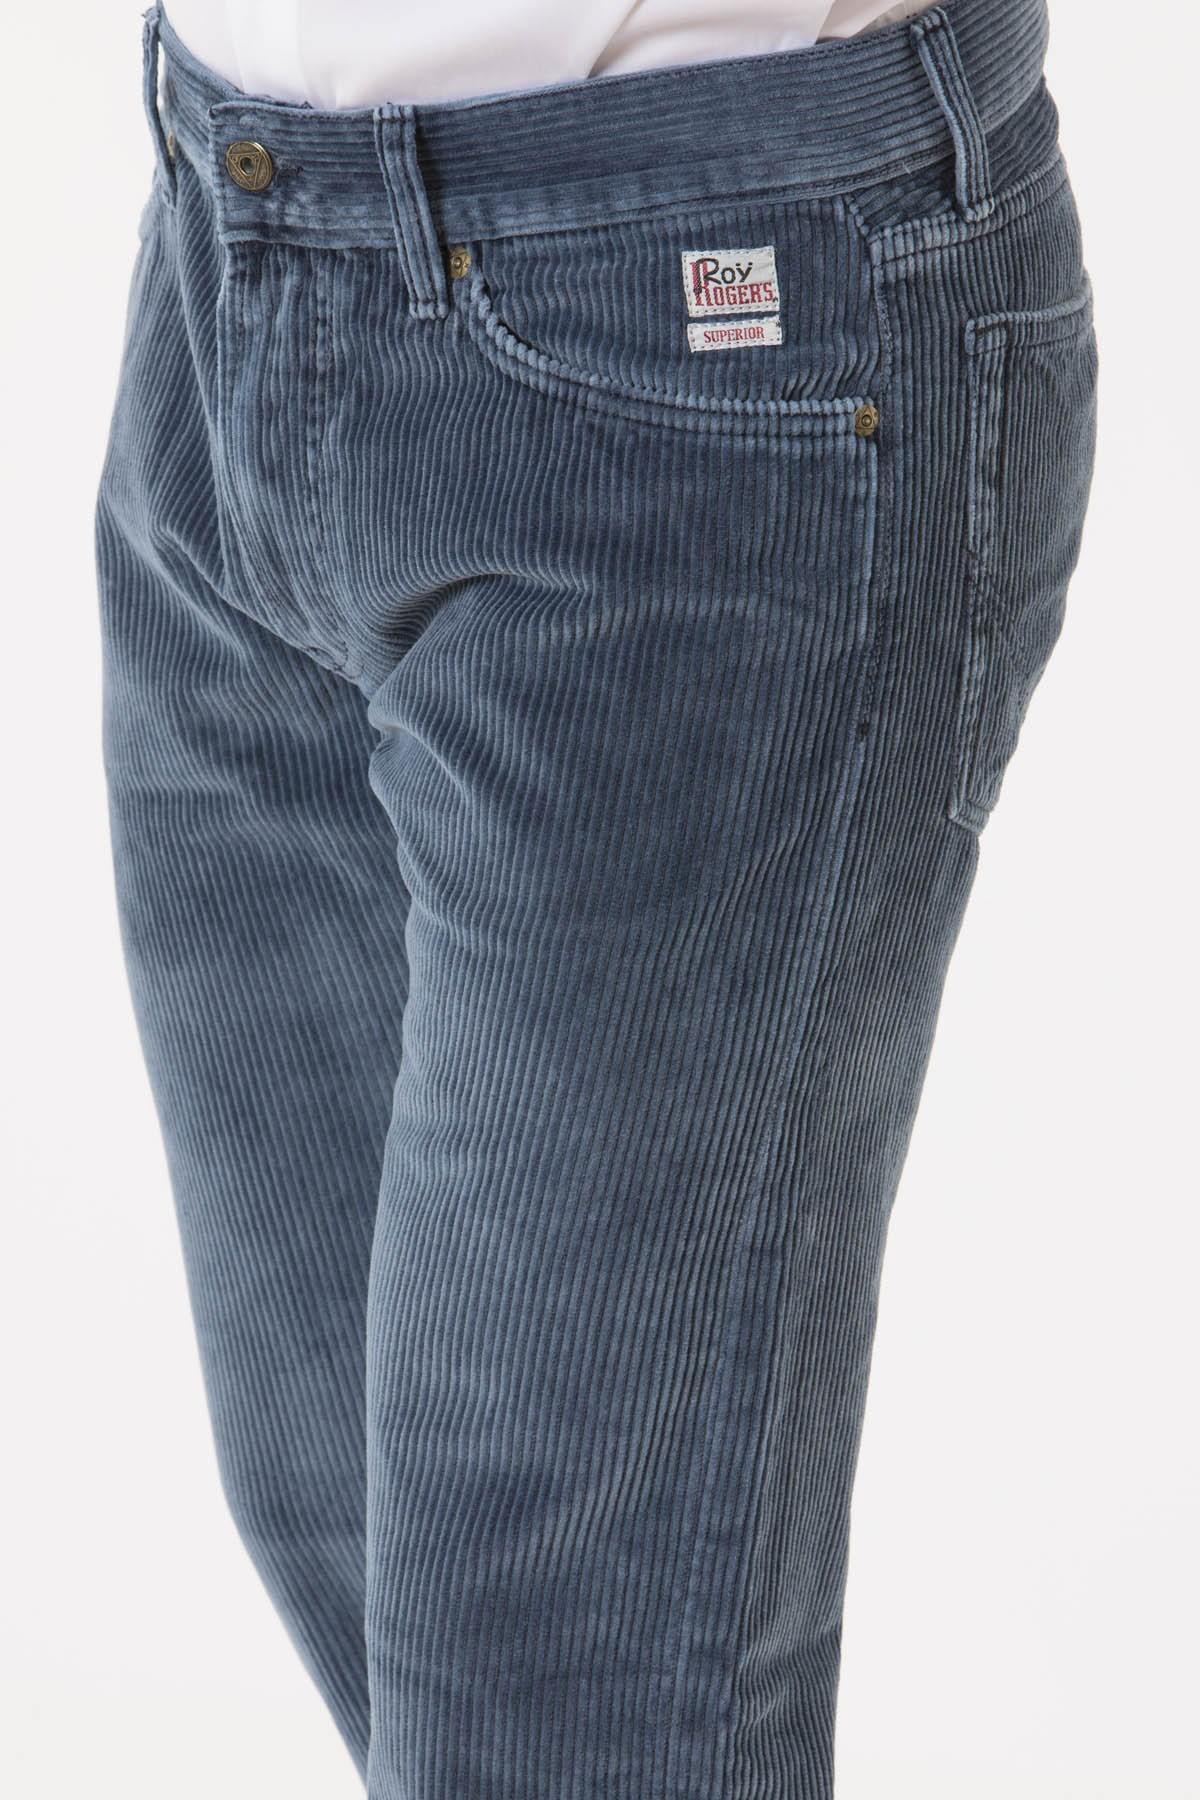 design di qualità 4a828 da5ee Pantaloni per uomo ROY ROGER'S A/I 18-19